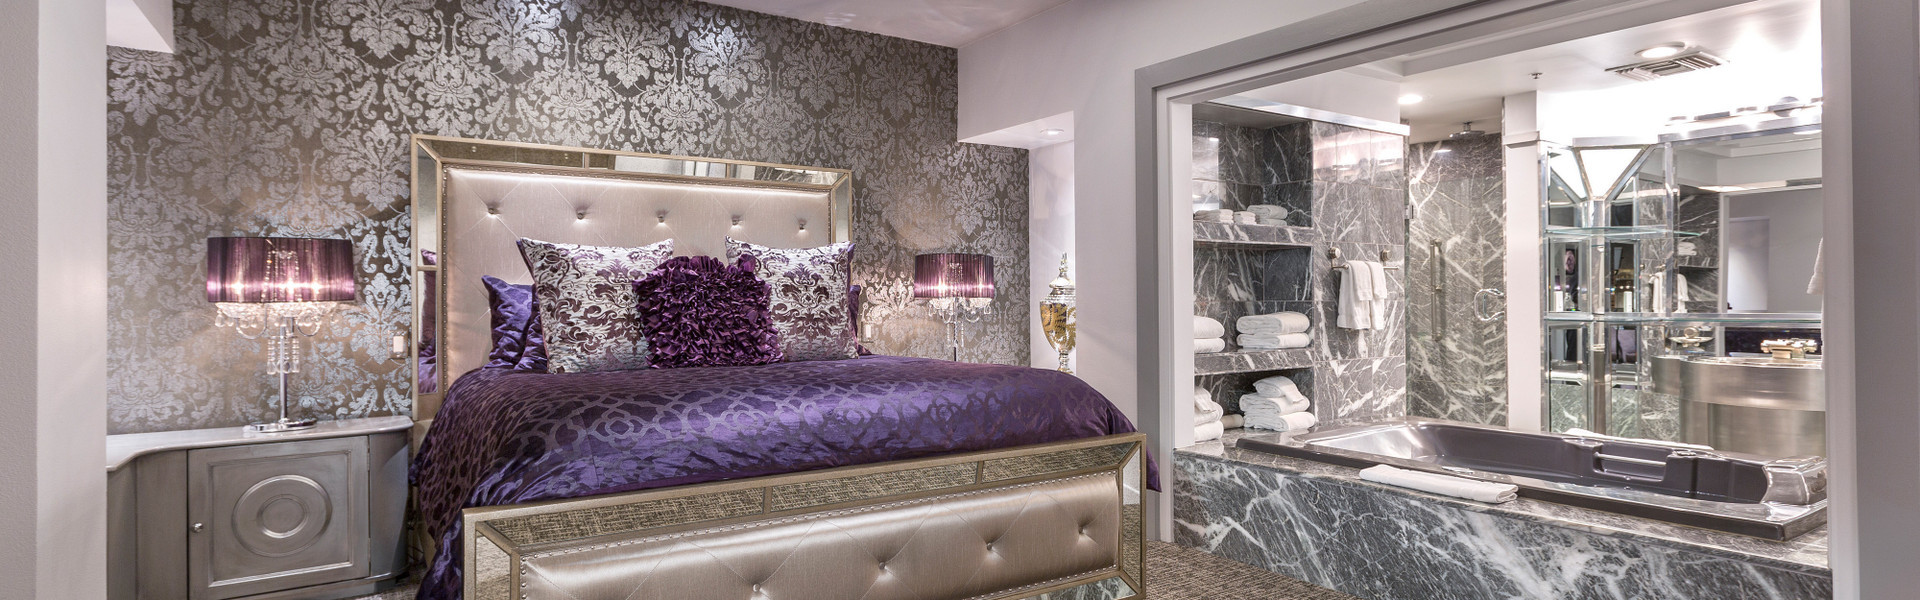 Luxury Suites Las Vegas | Westgate Las Vegas Resort & Casino | Westgate Resorts